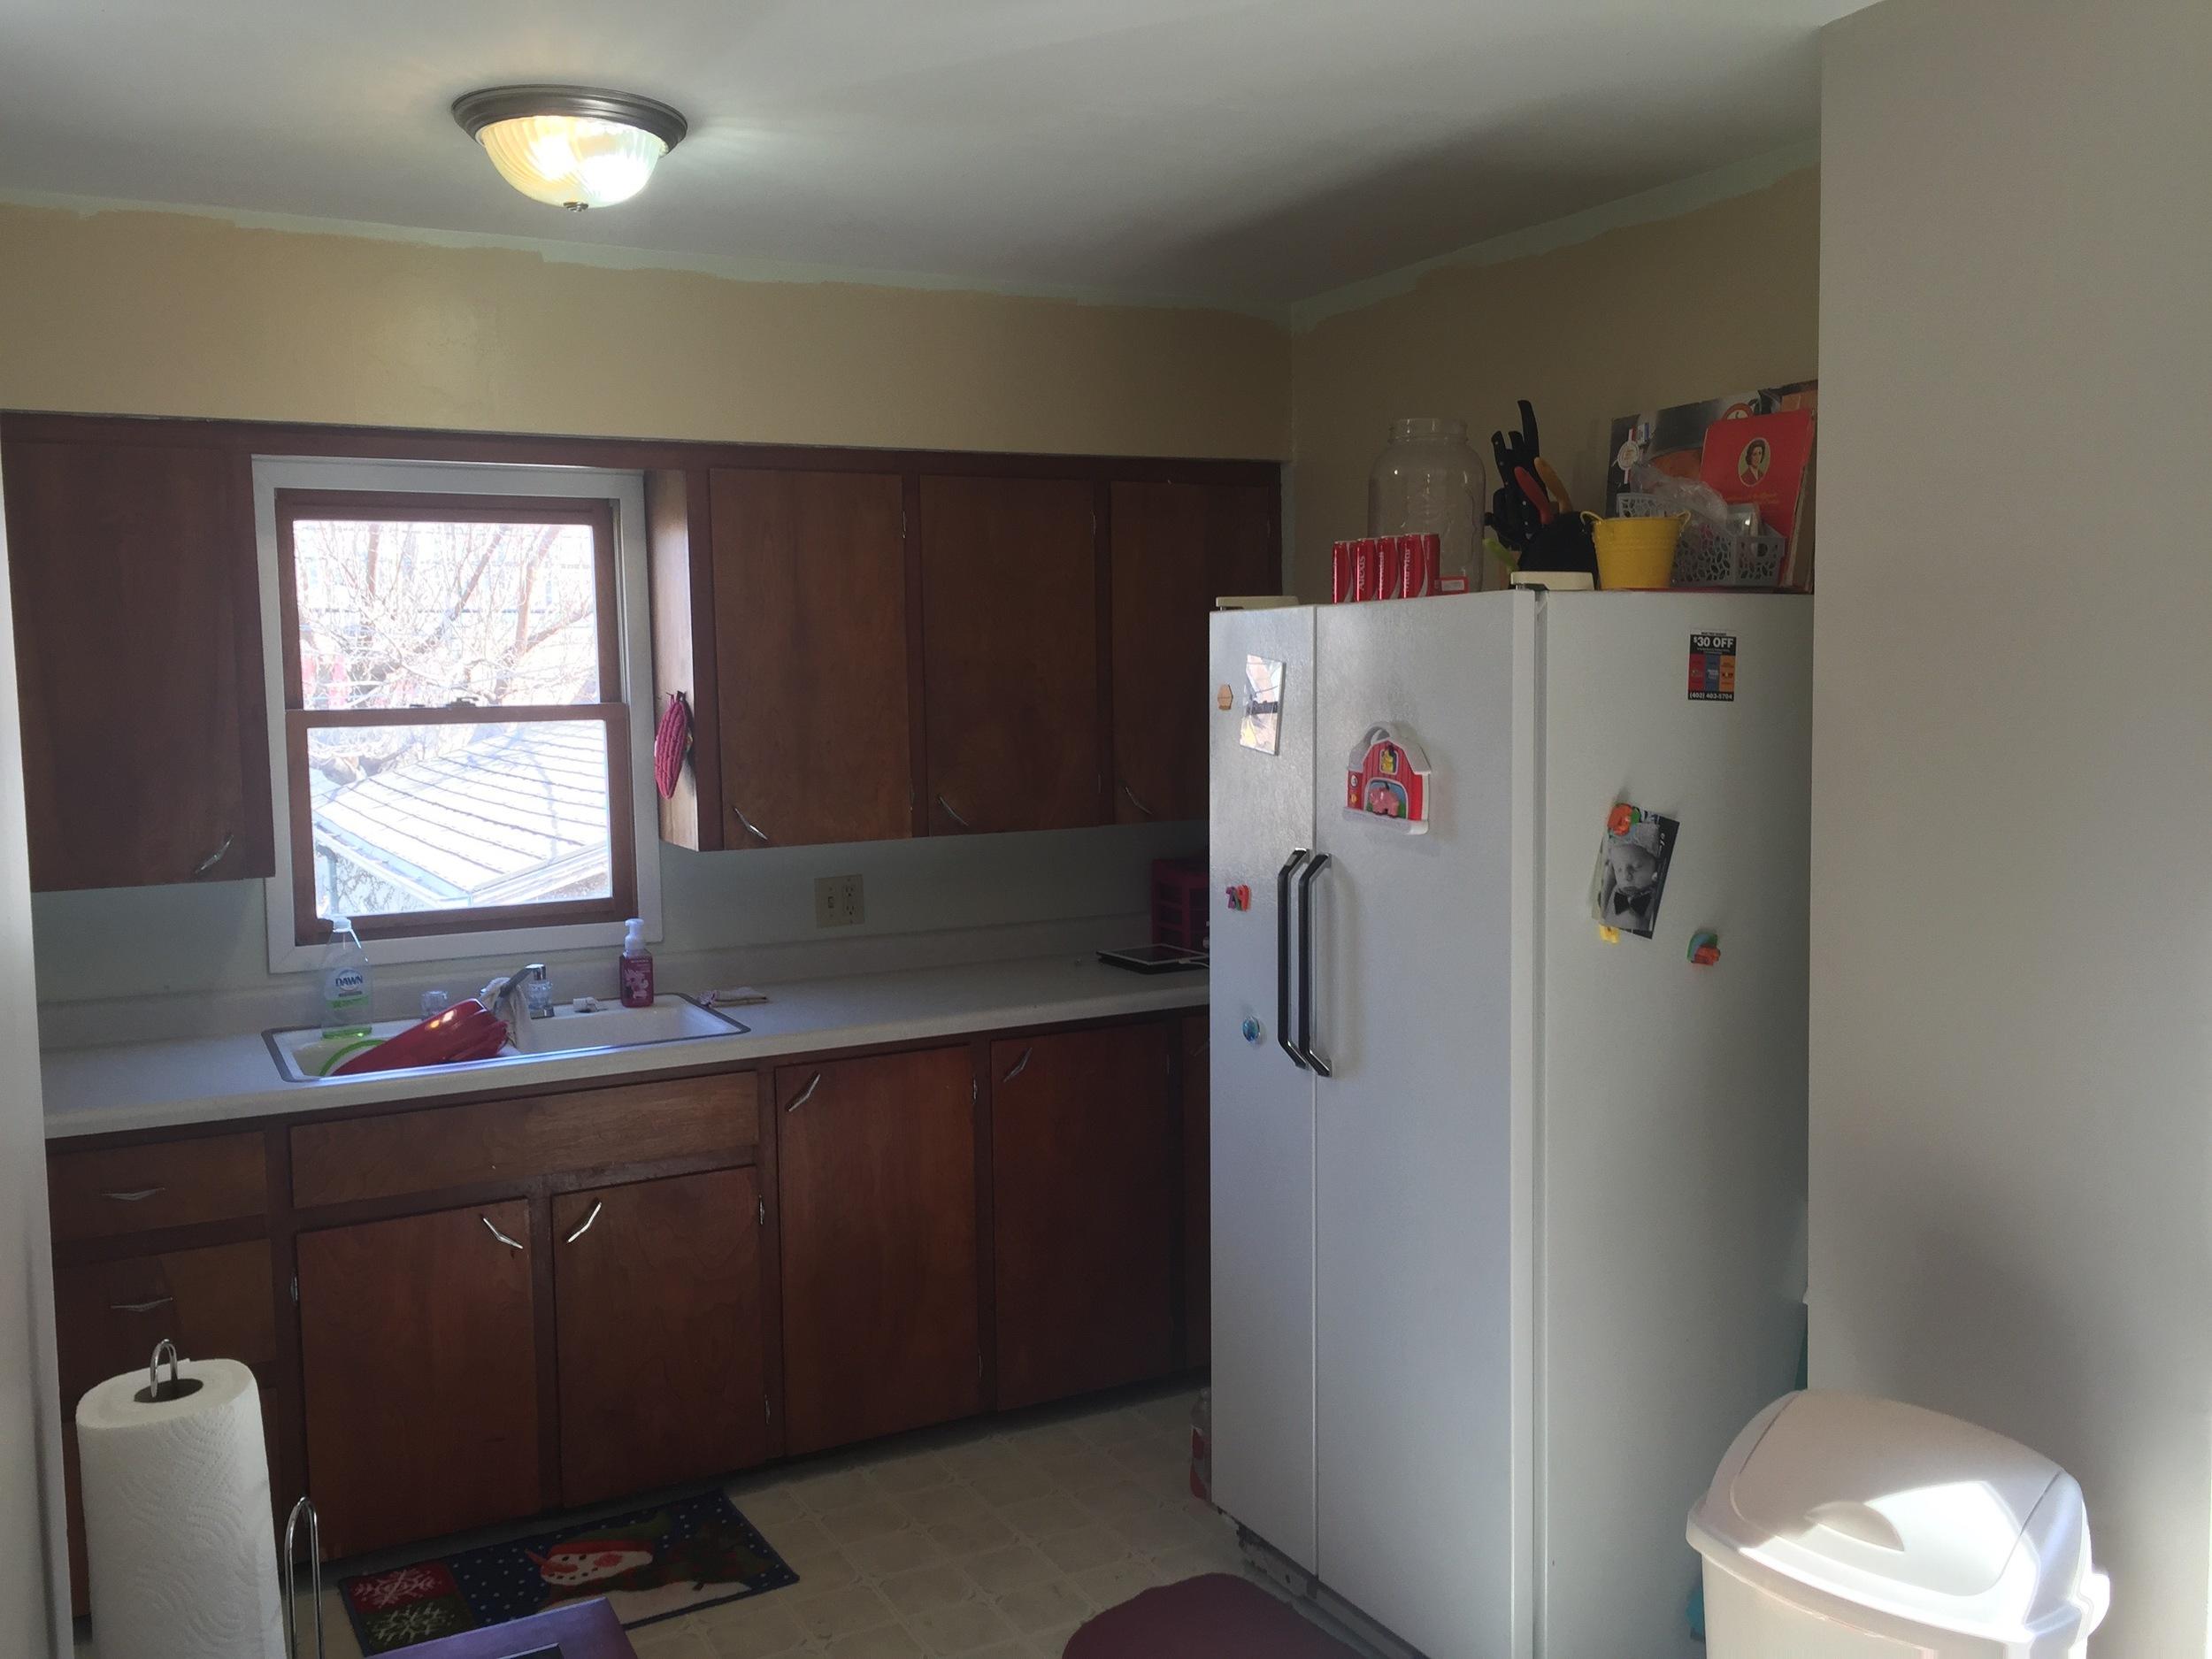 Mayberry Rental Kitchen Before - 10.jpg